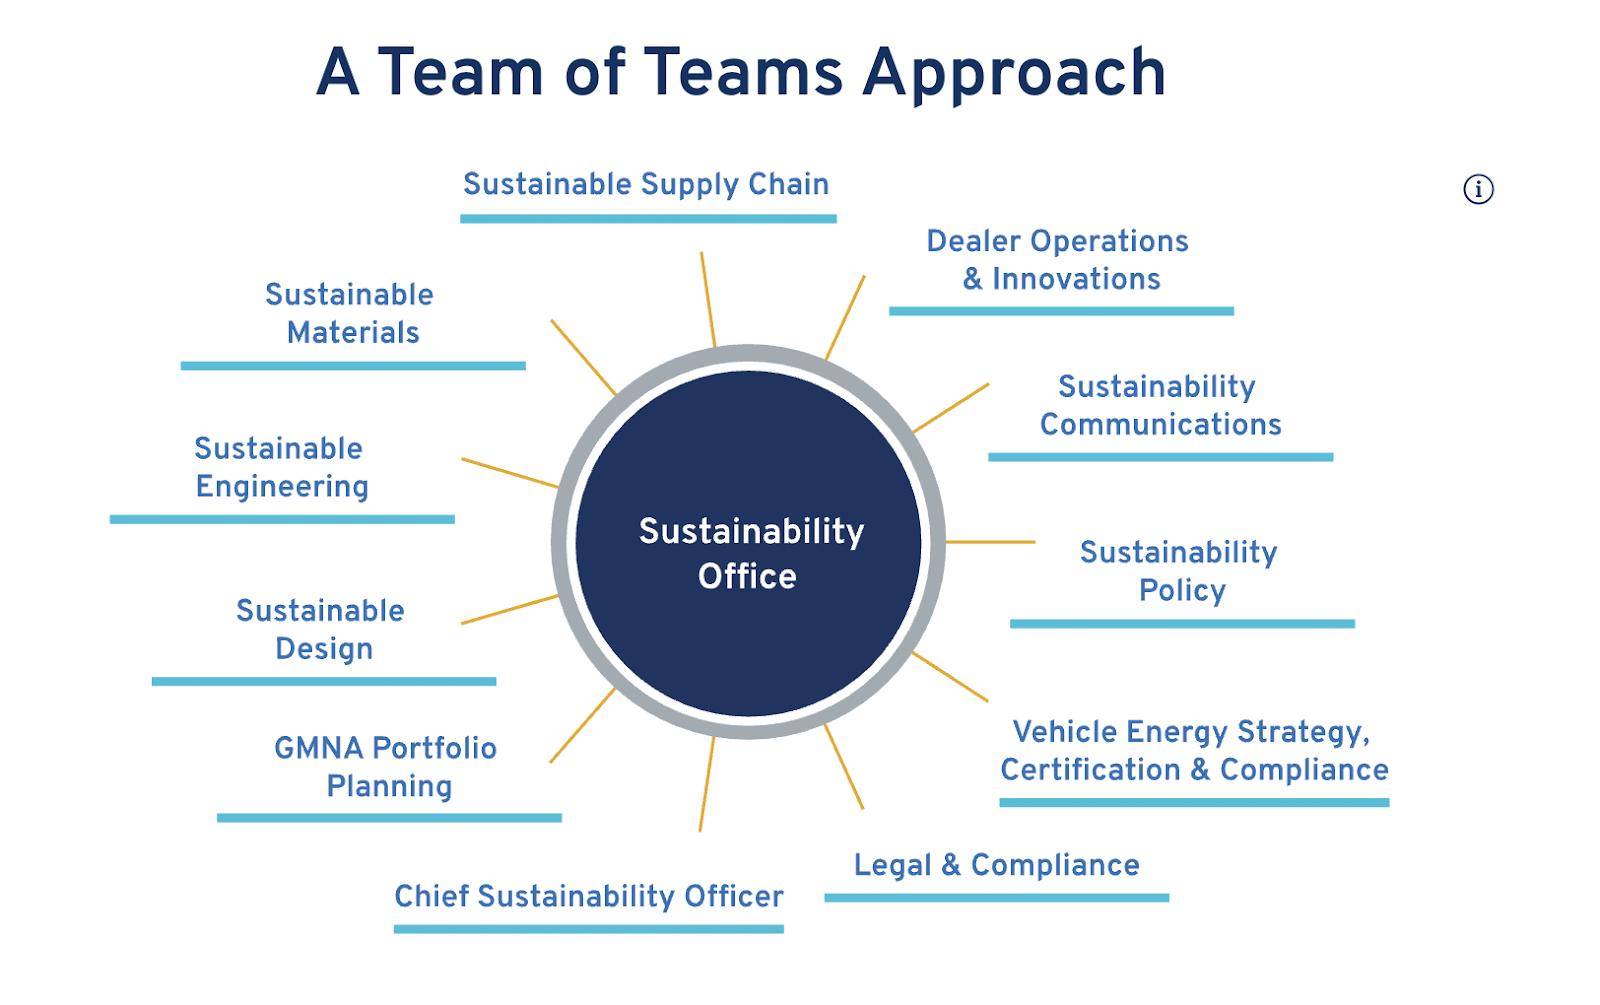 General Motors Sustainability Office